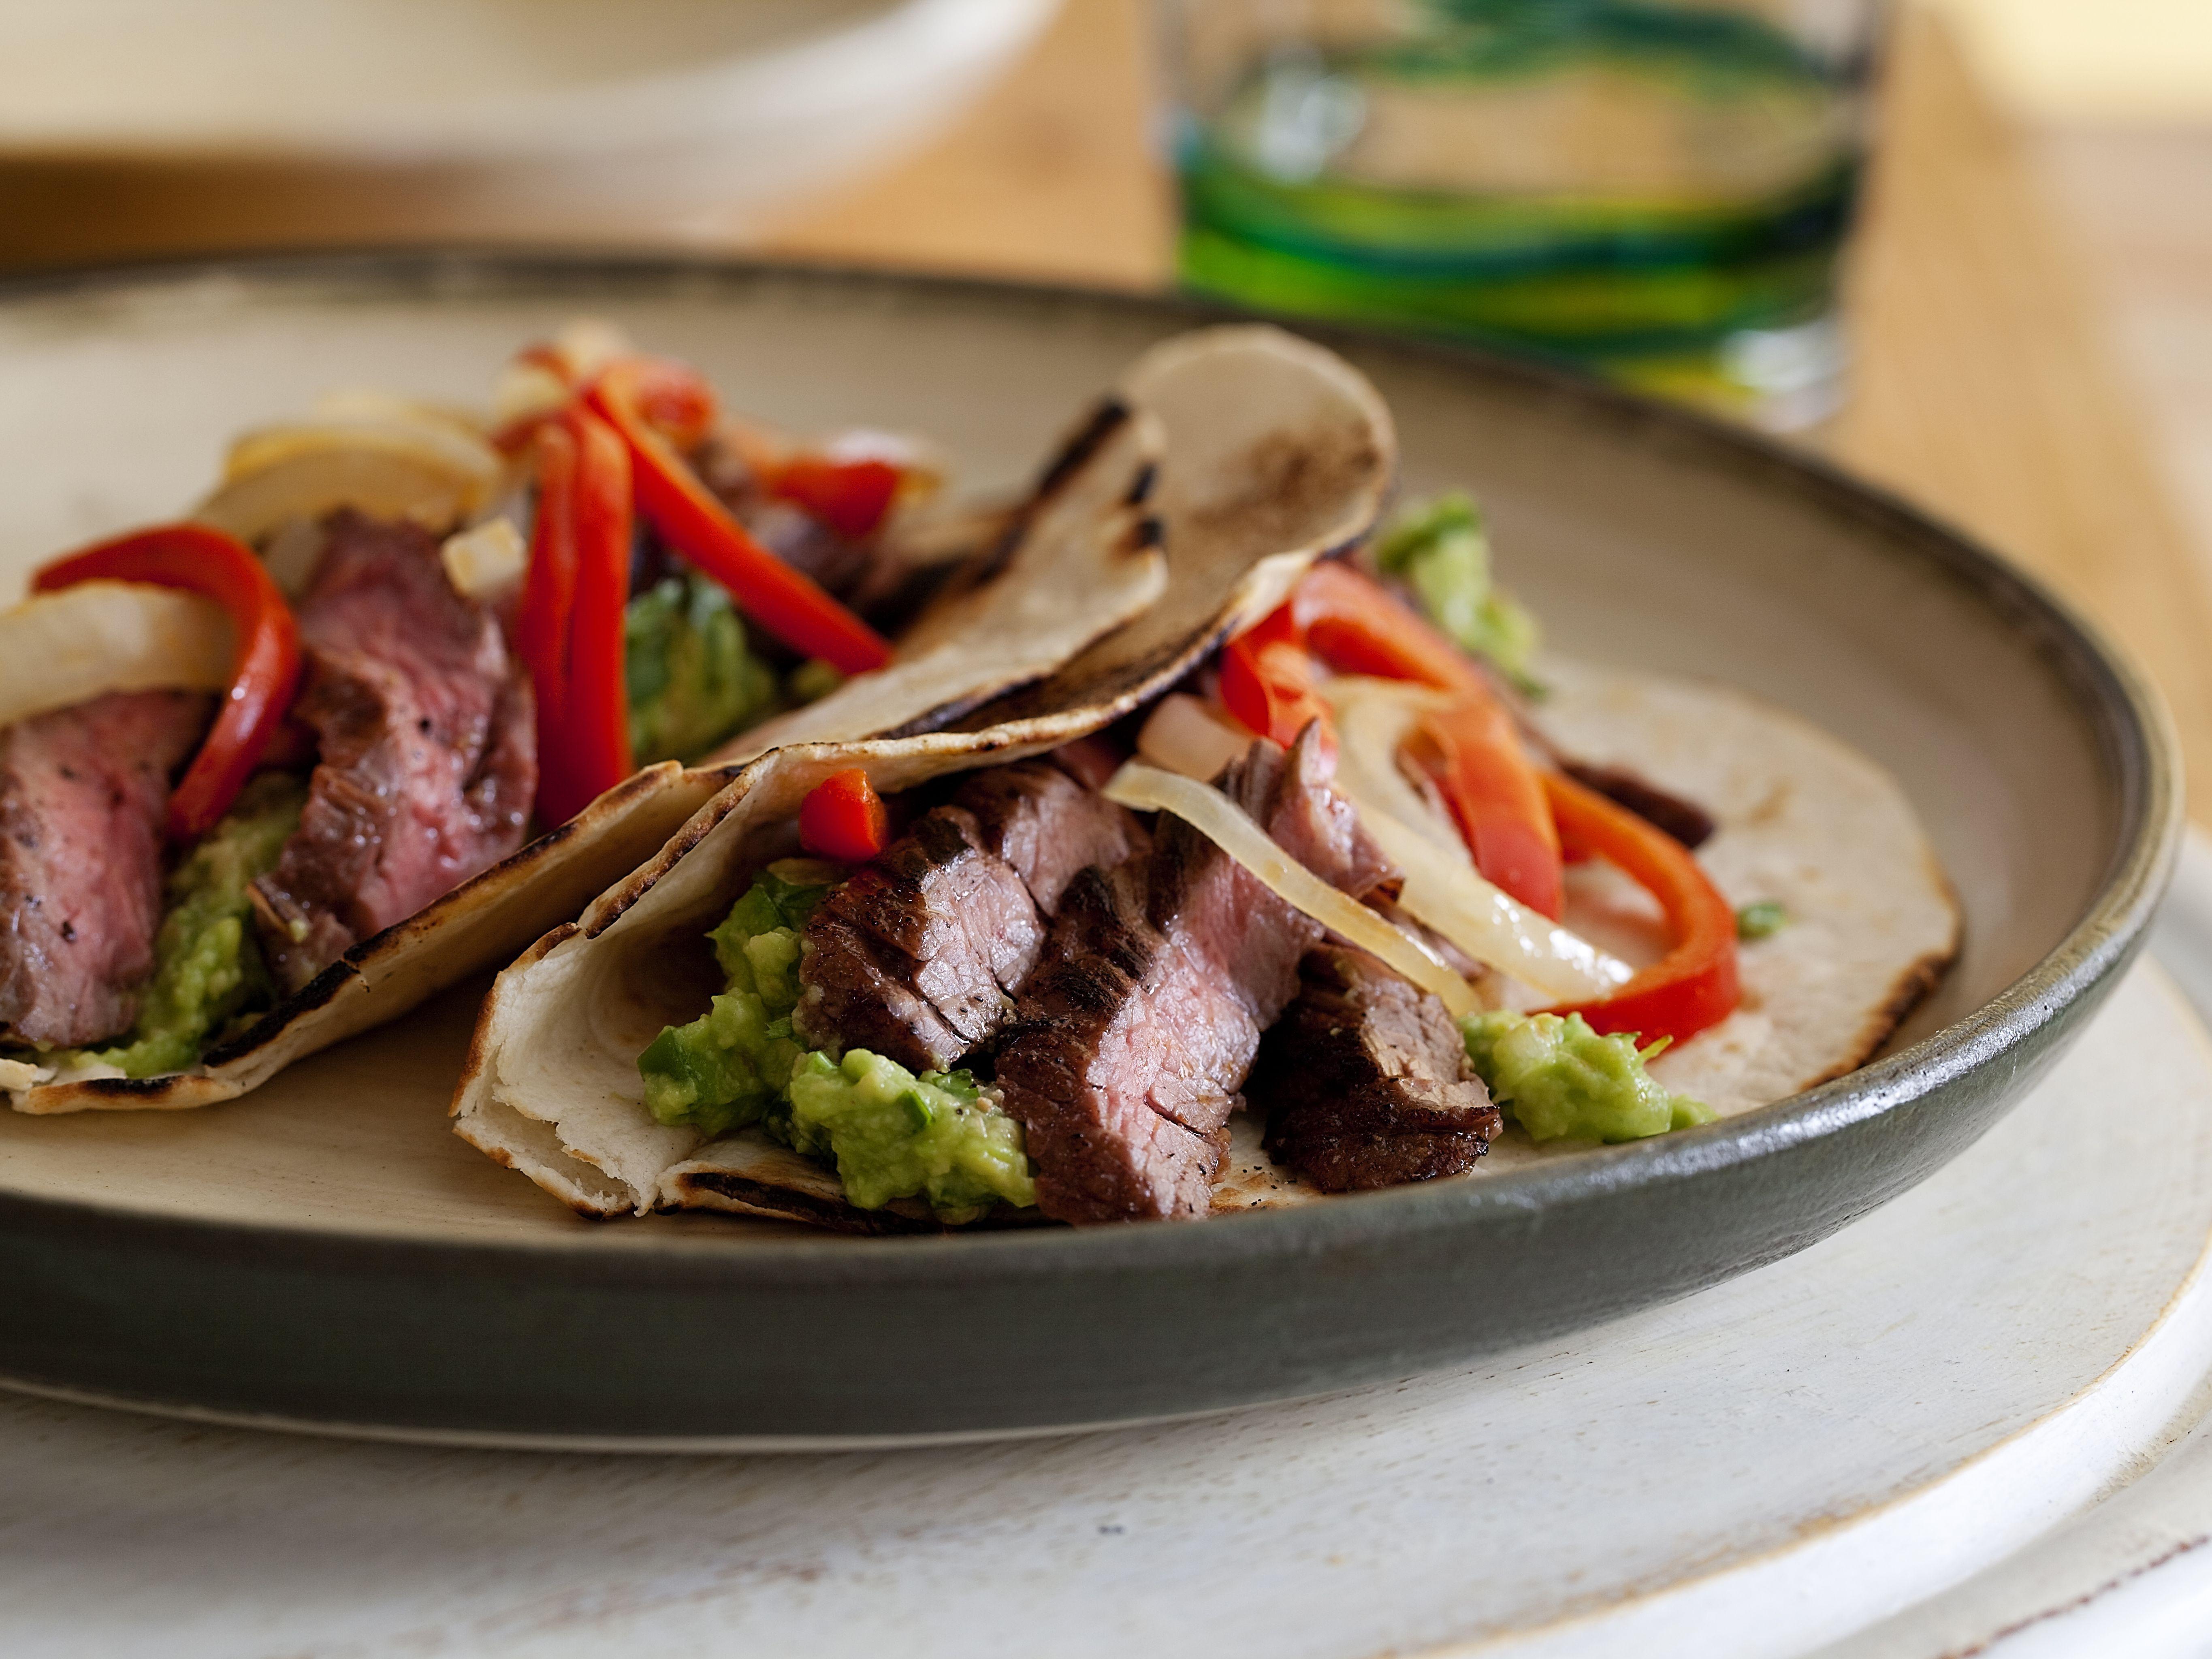 Fajitas #beeffajitamarinade Fantastic fajita marinade - have used it on flank steak as written in the recipe, but it's great on chicken, too! #steakfajitamarinade Fajitas #beeffajitamarinade Fantastic fajita marinade - have used it on flank steak as written in the recipe, but it's great on chicken, too! #beeffajitamarinade Fajitas #beeffajitamarinade Fantastic fajita marinade - have used it on flank steak as written in the recipe, but it's great on chicken, too! #steakfajitamarinade Fajitas #bee #steakfajitamarinade